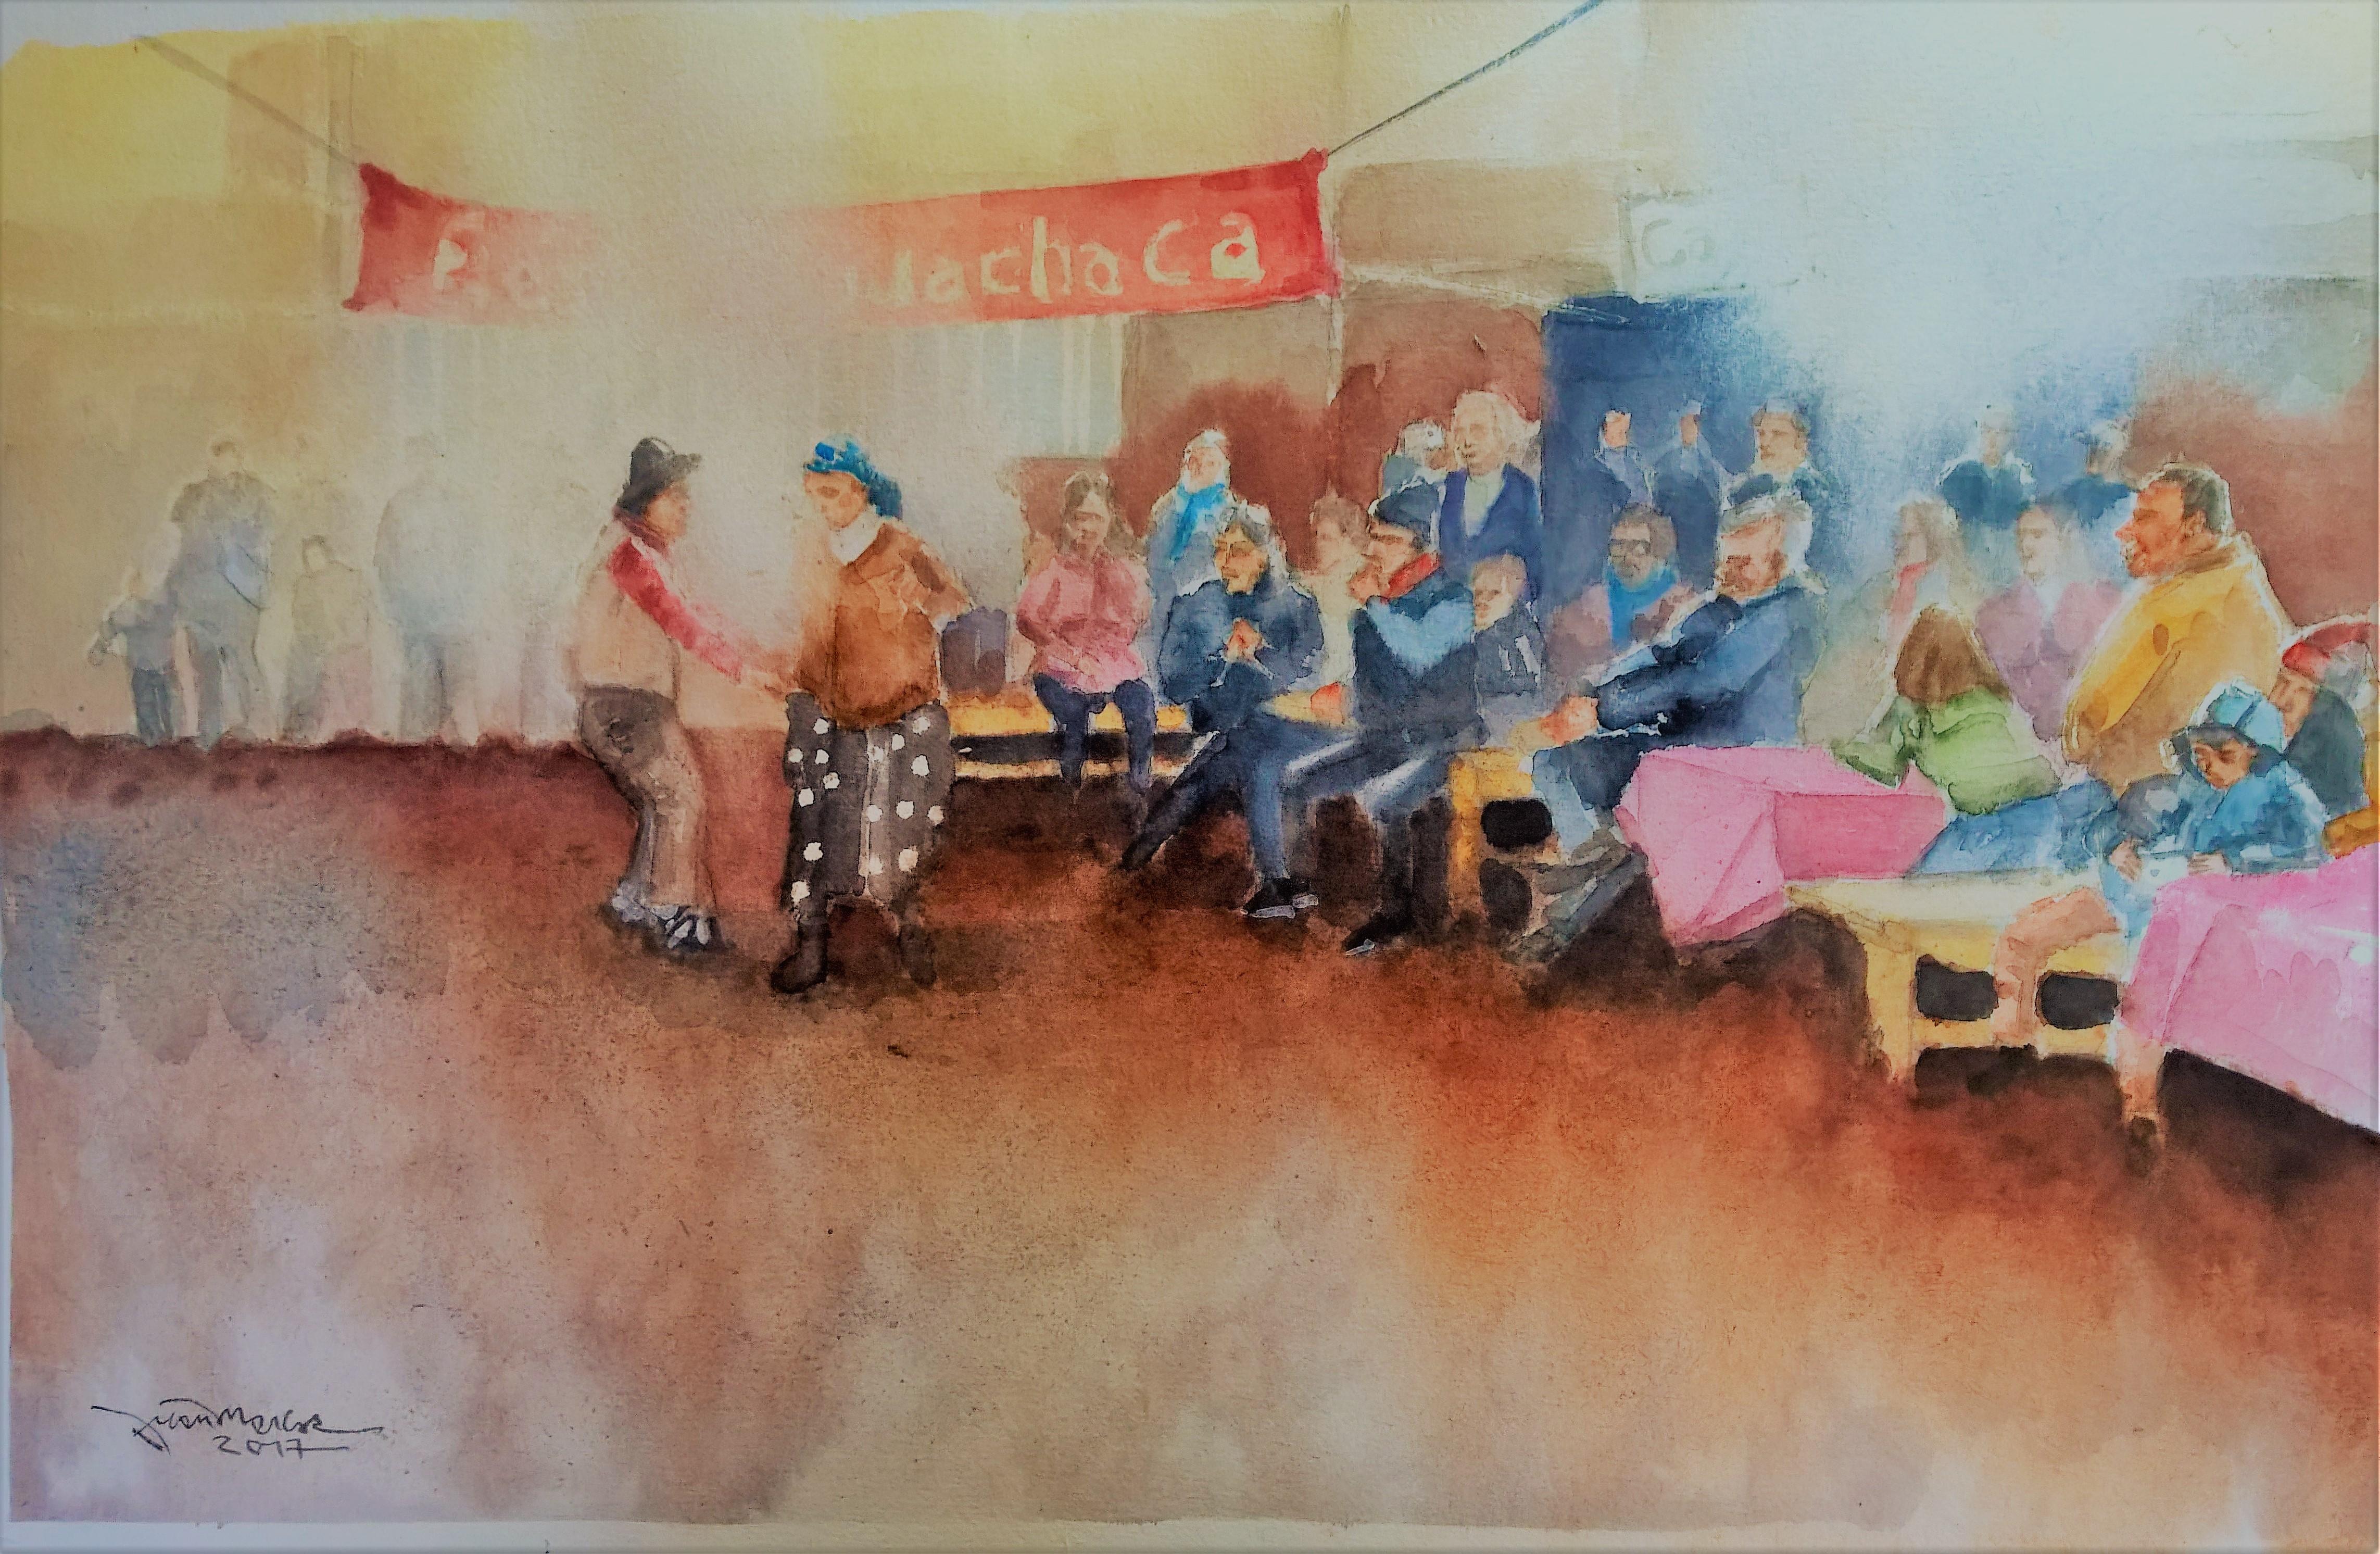 Fiesta Huachaca